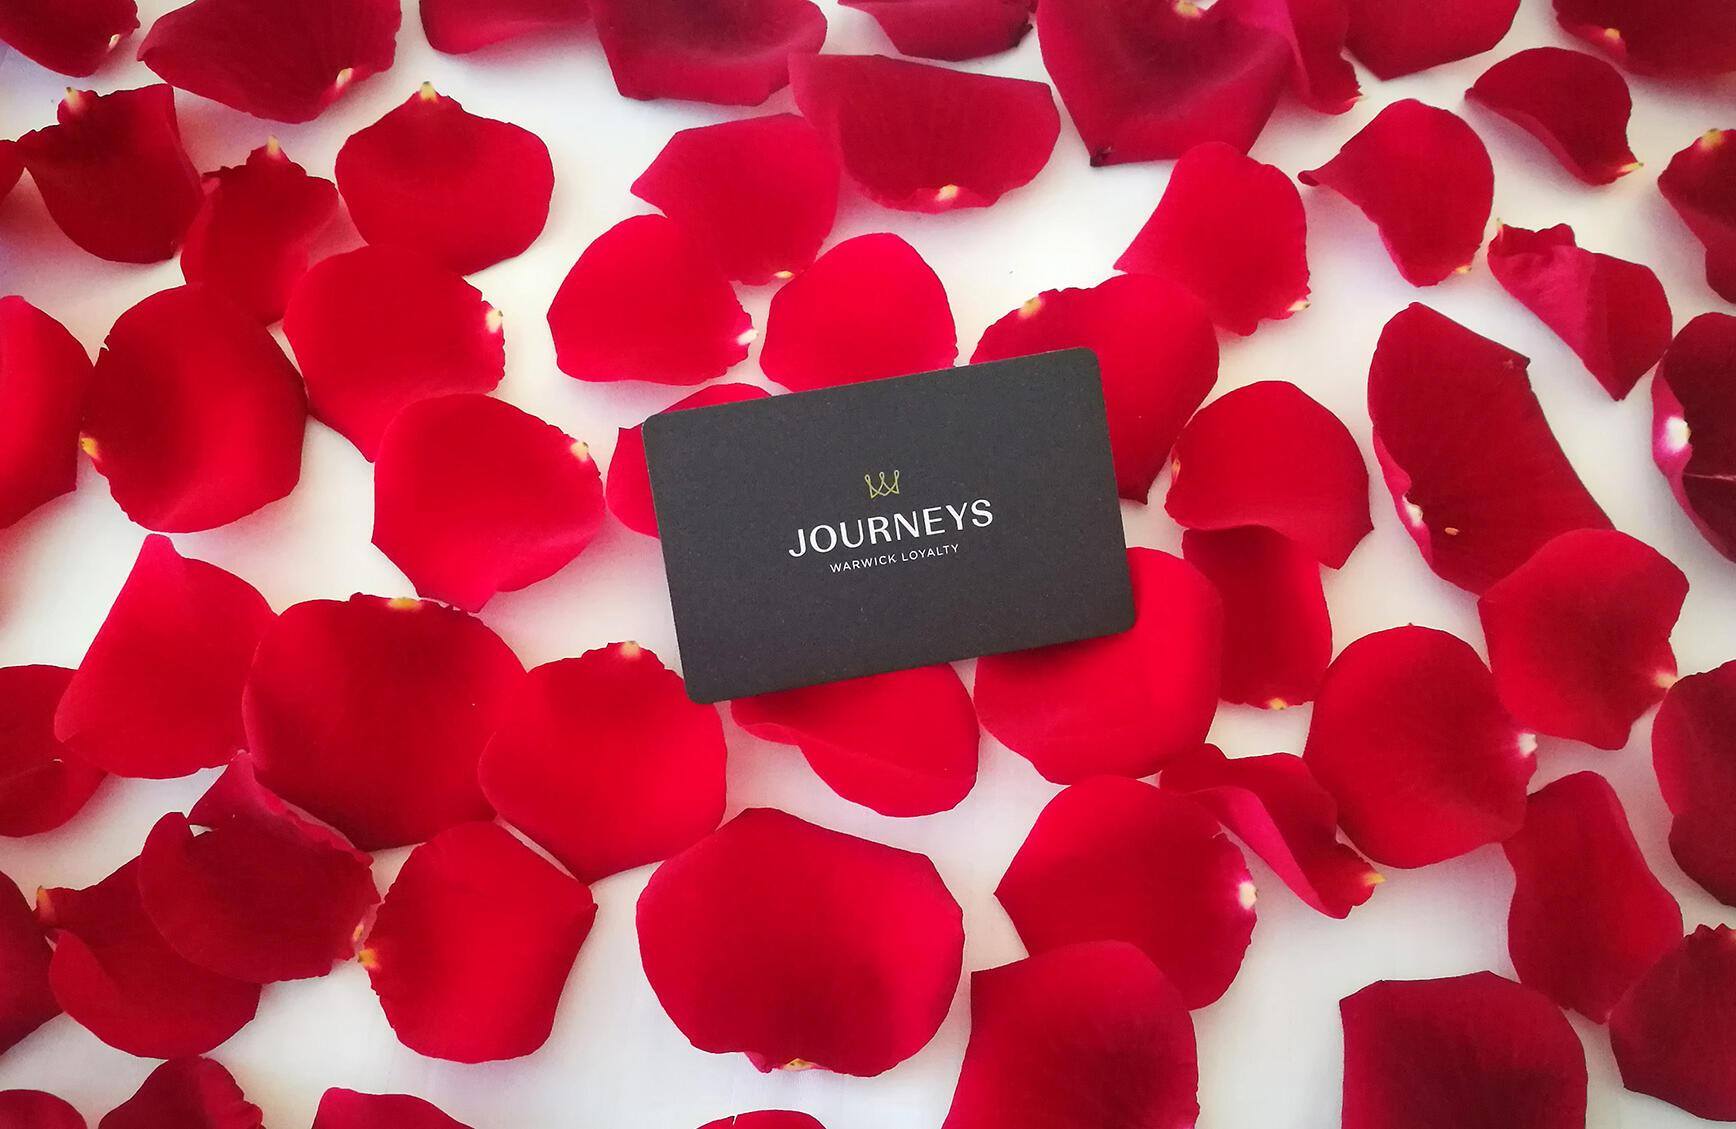 warwick journeys card on rose petals